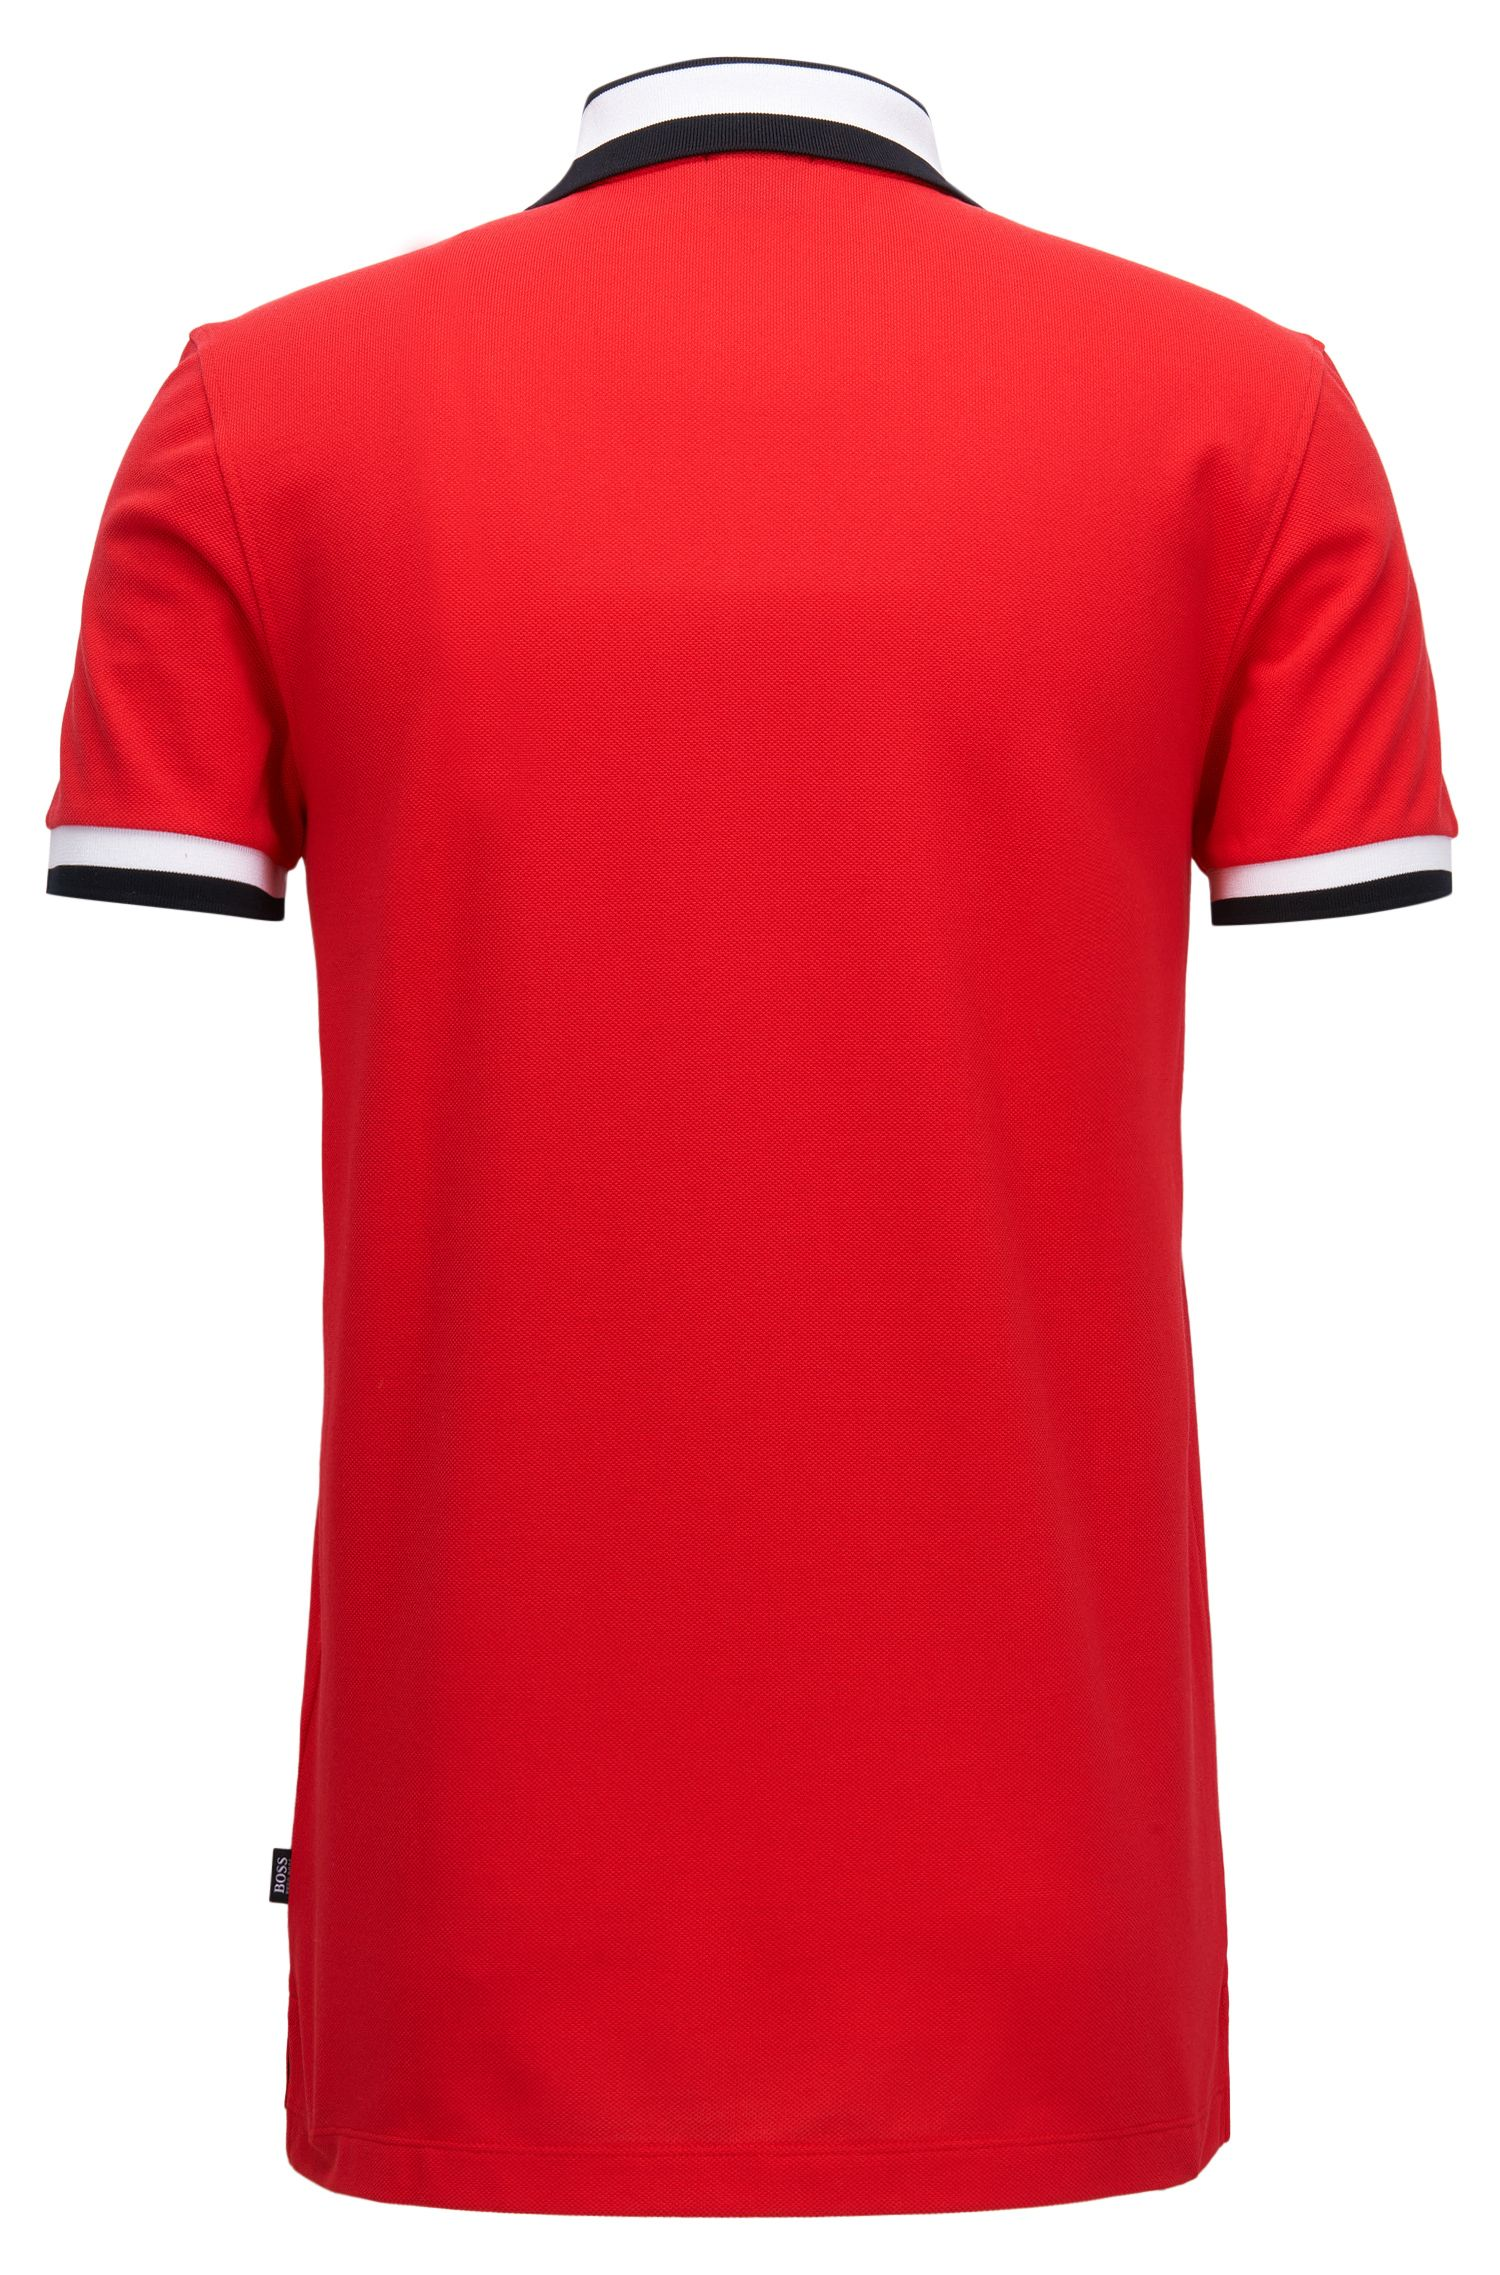 Slim-Fit Poloshirt aus Baumwoll-Piqué